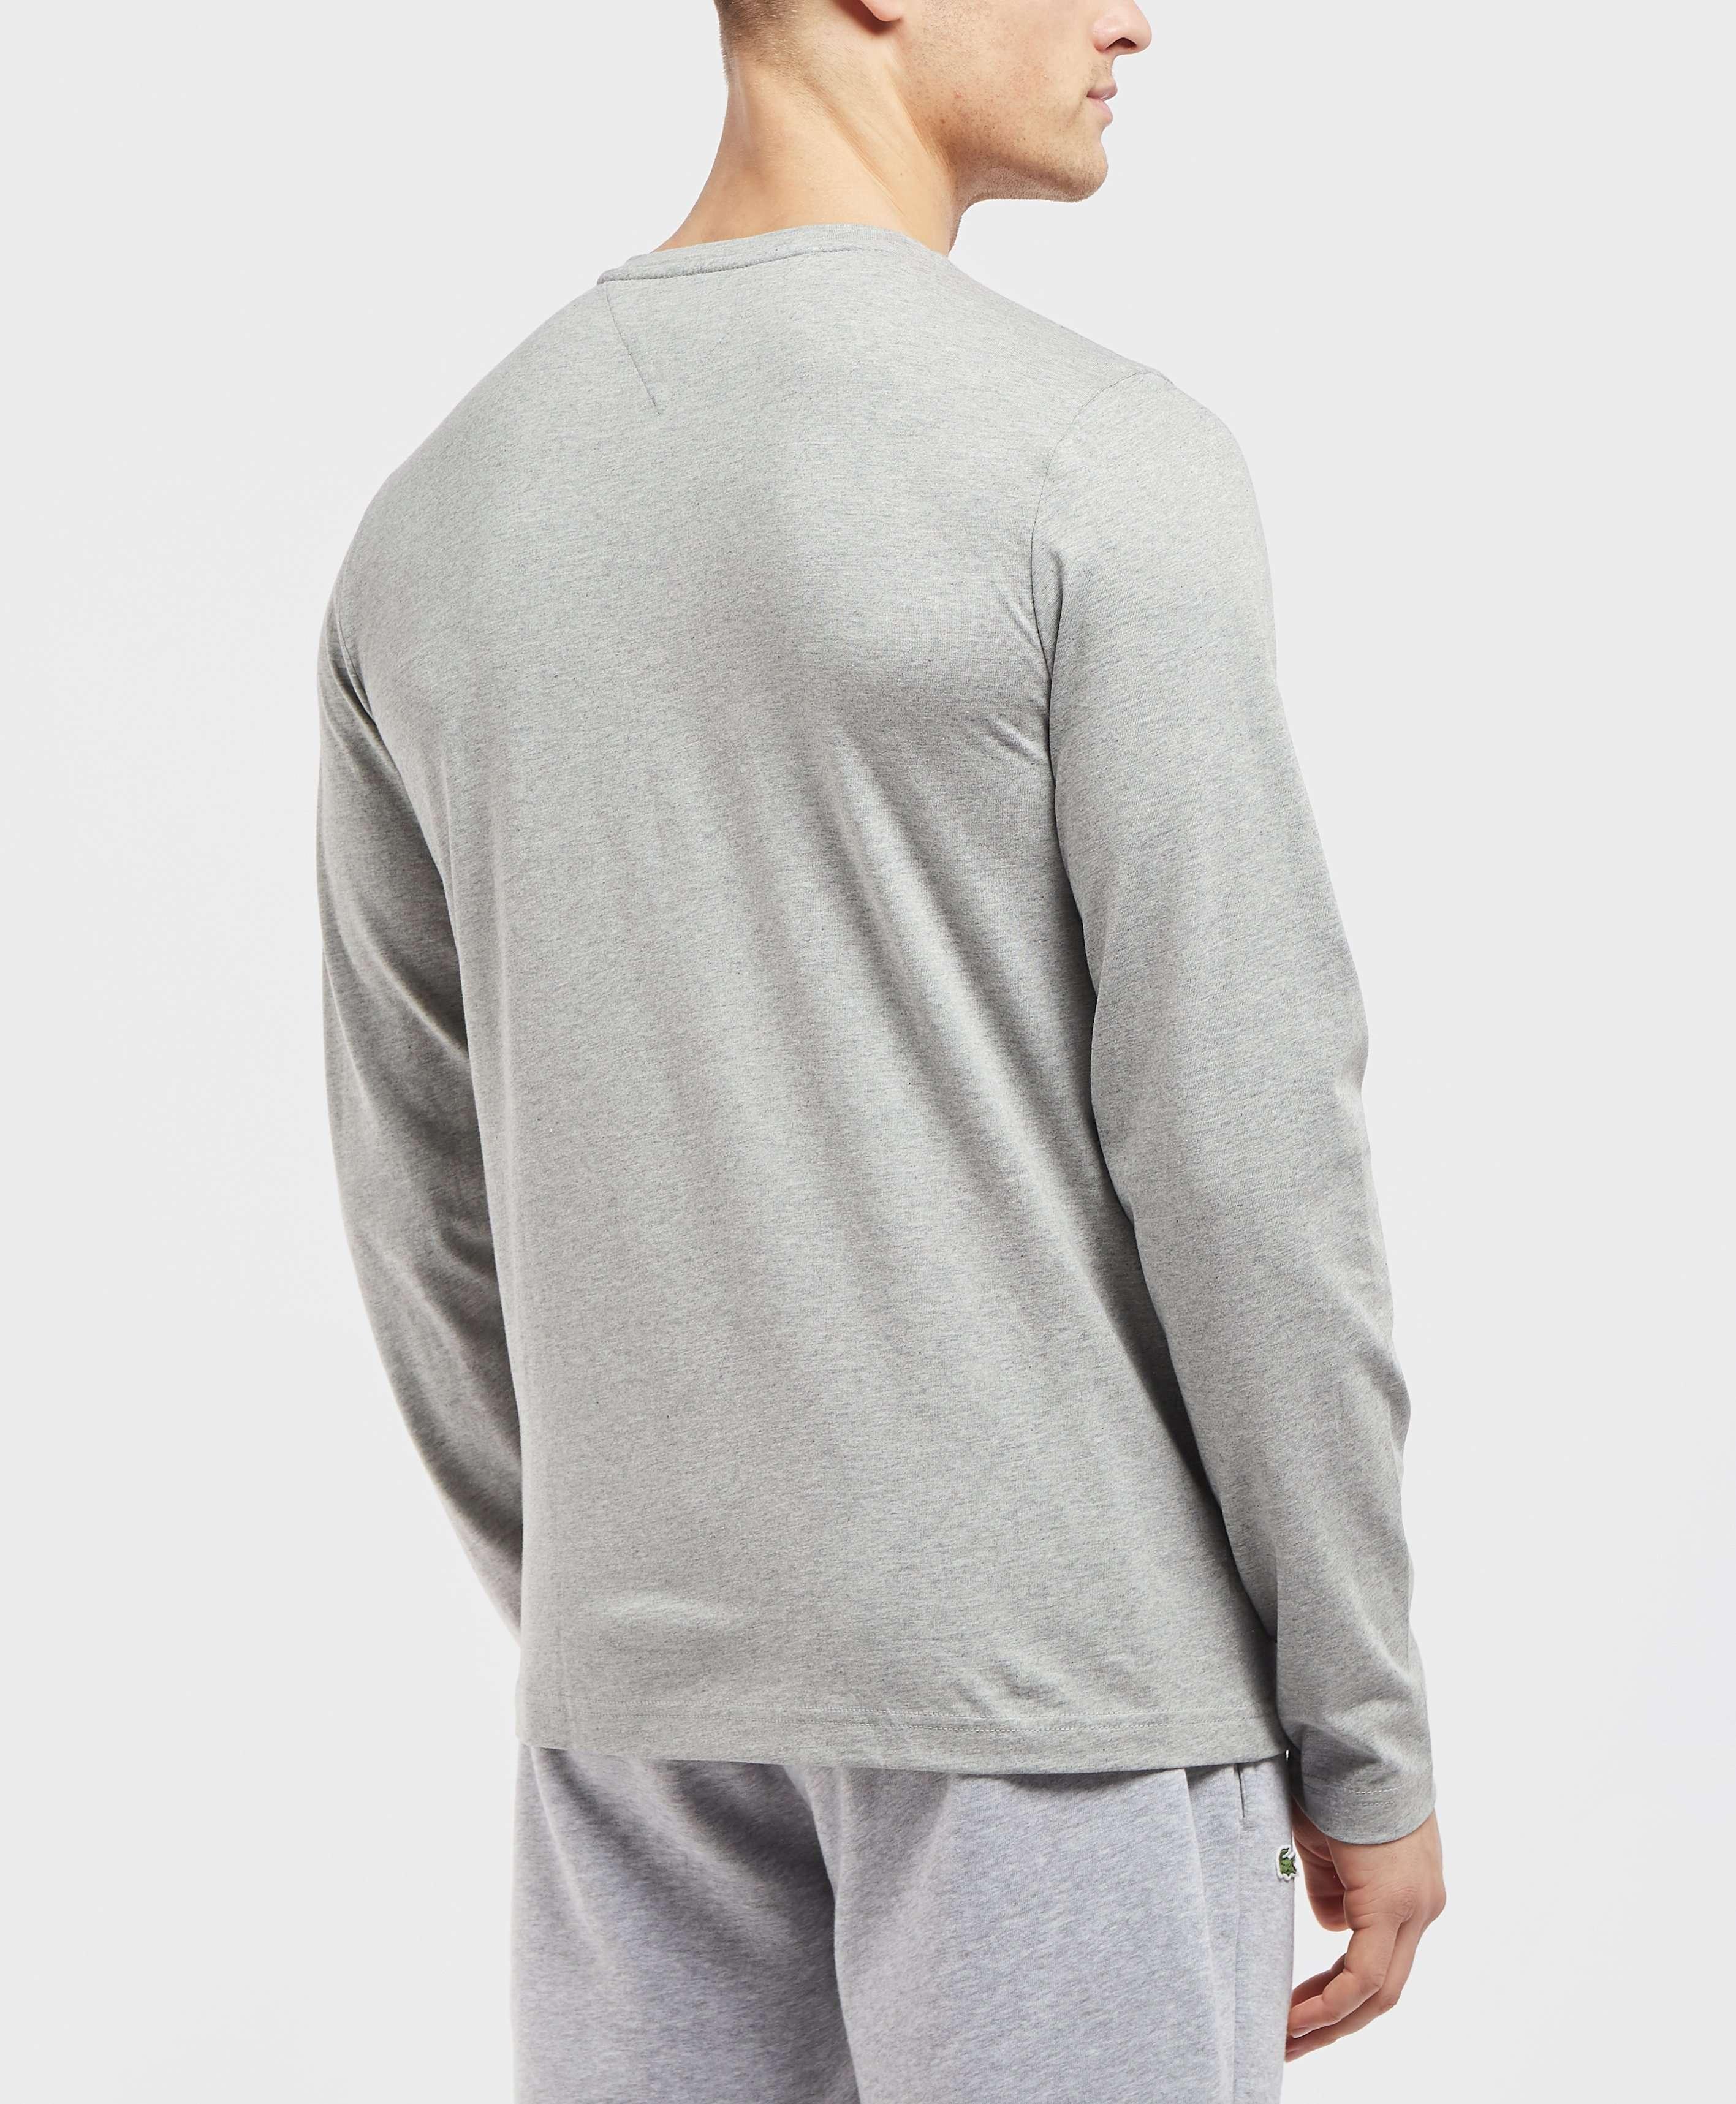 Tommy Hilfiger Long Sleeve Arm Logo T-Shirt